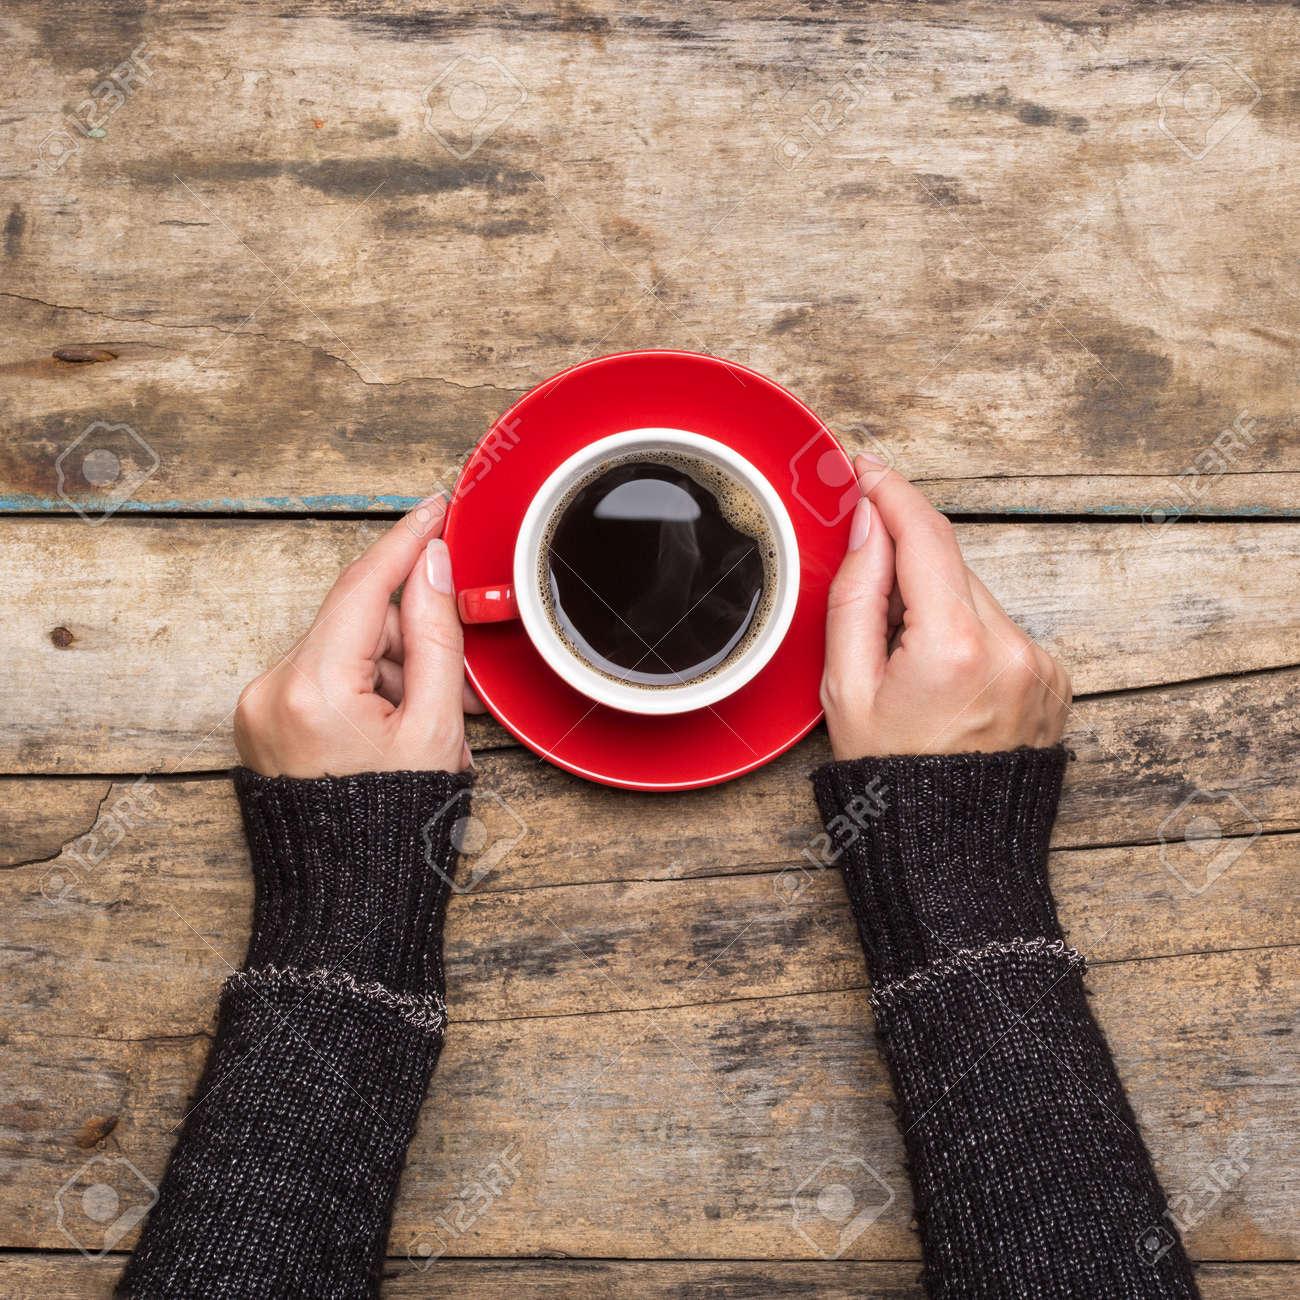 Coffee break background. Stop working drink espresso - 47319636